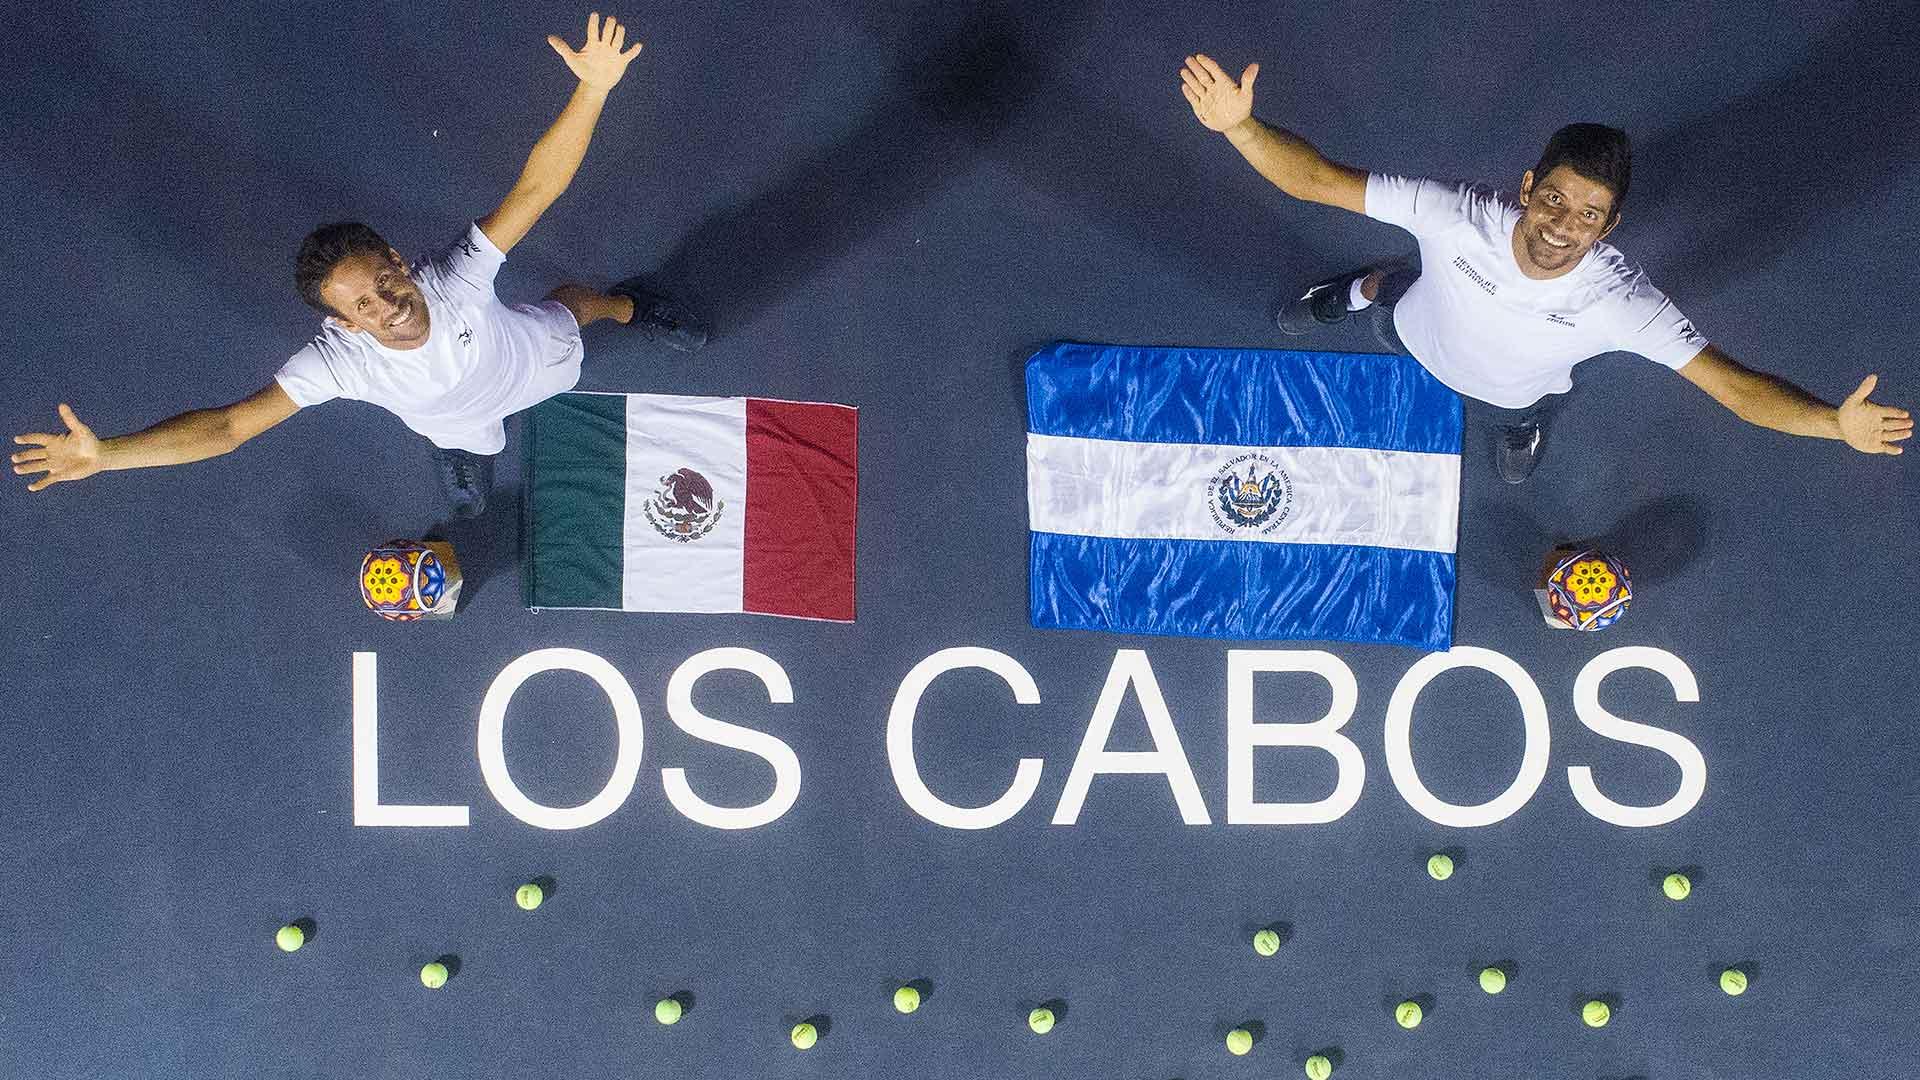 Los Cabos Doubles Title